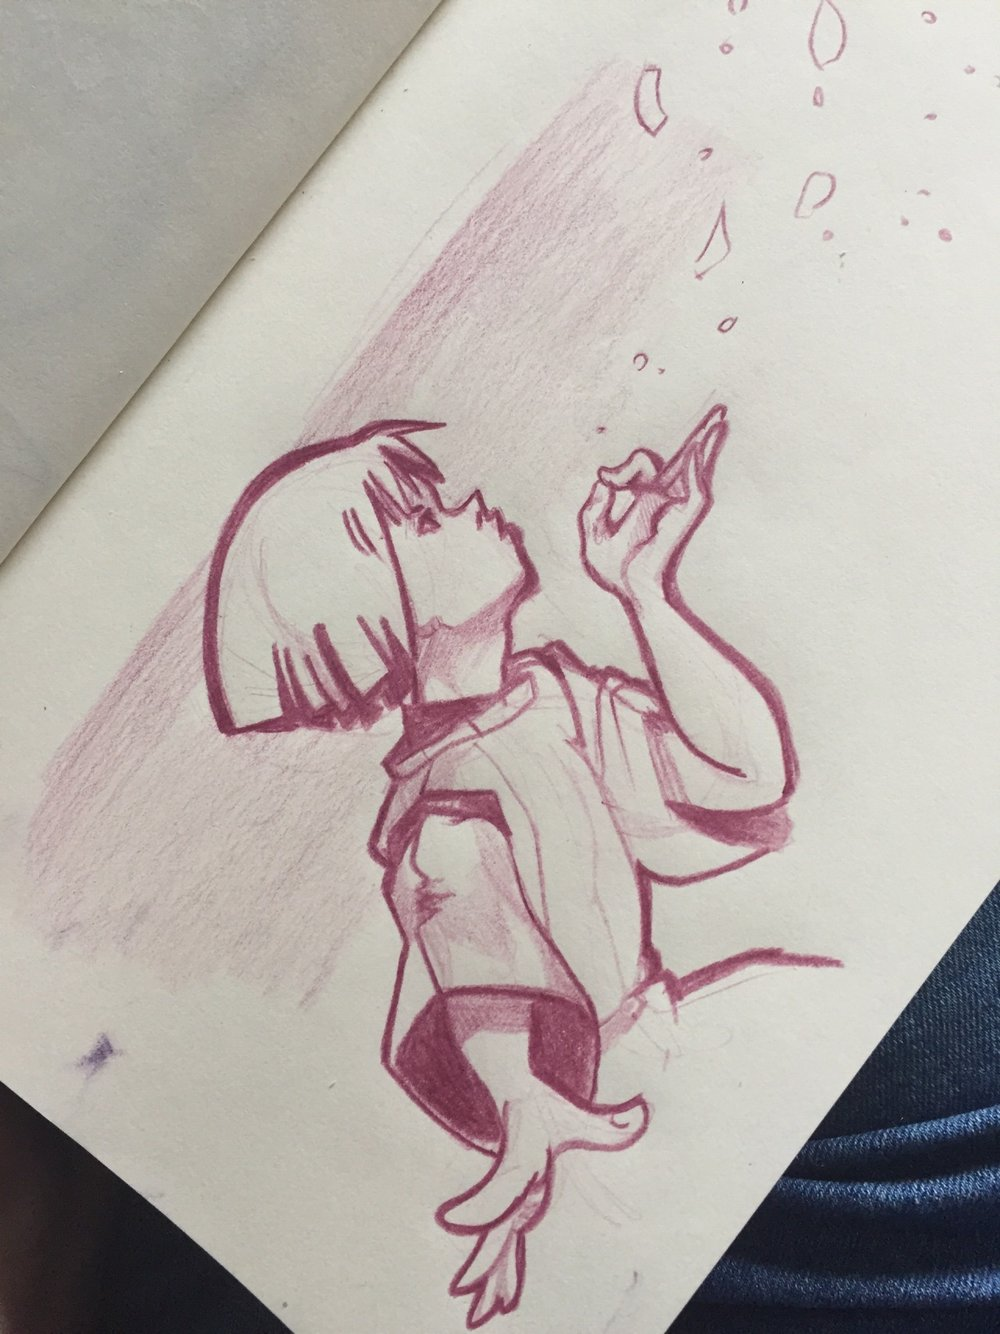 Amanda Belo's quick sketch!